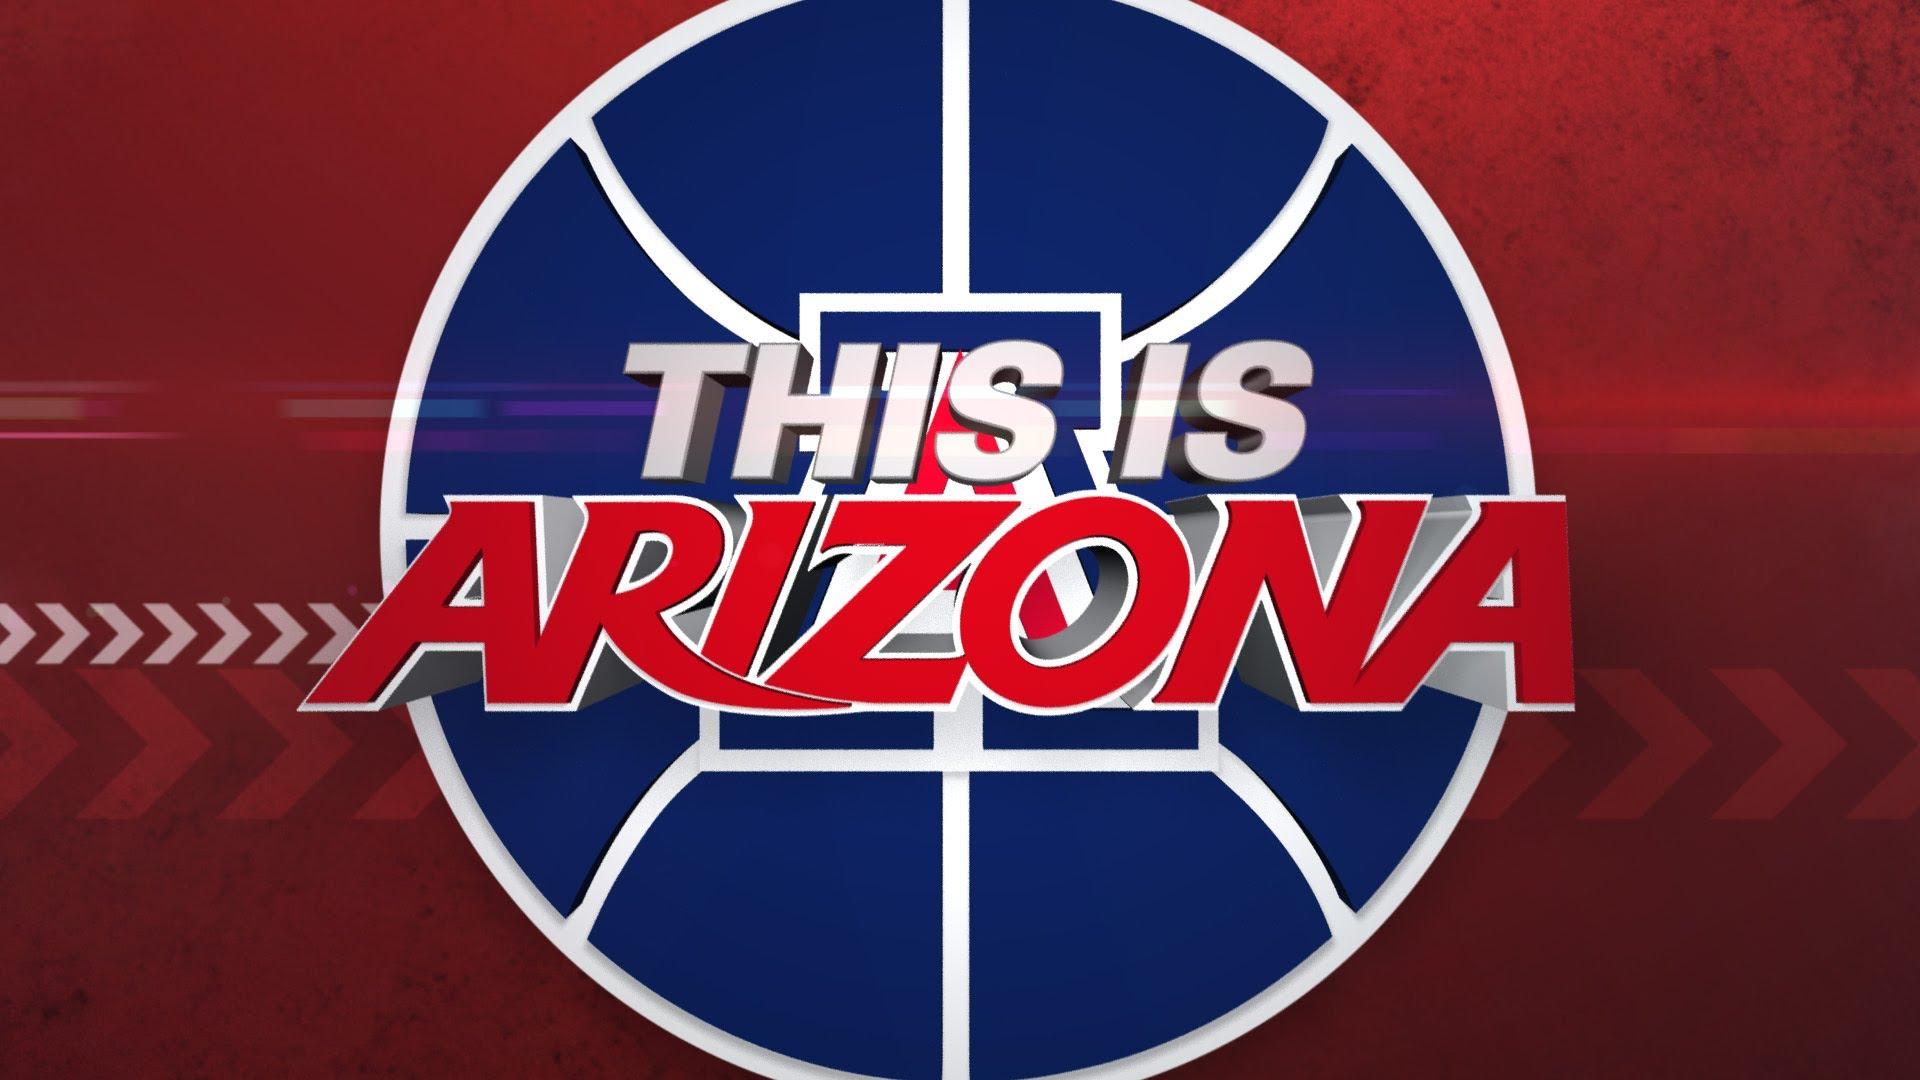 2013 Arizona Basketball 1920x1080